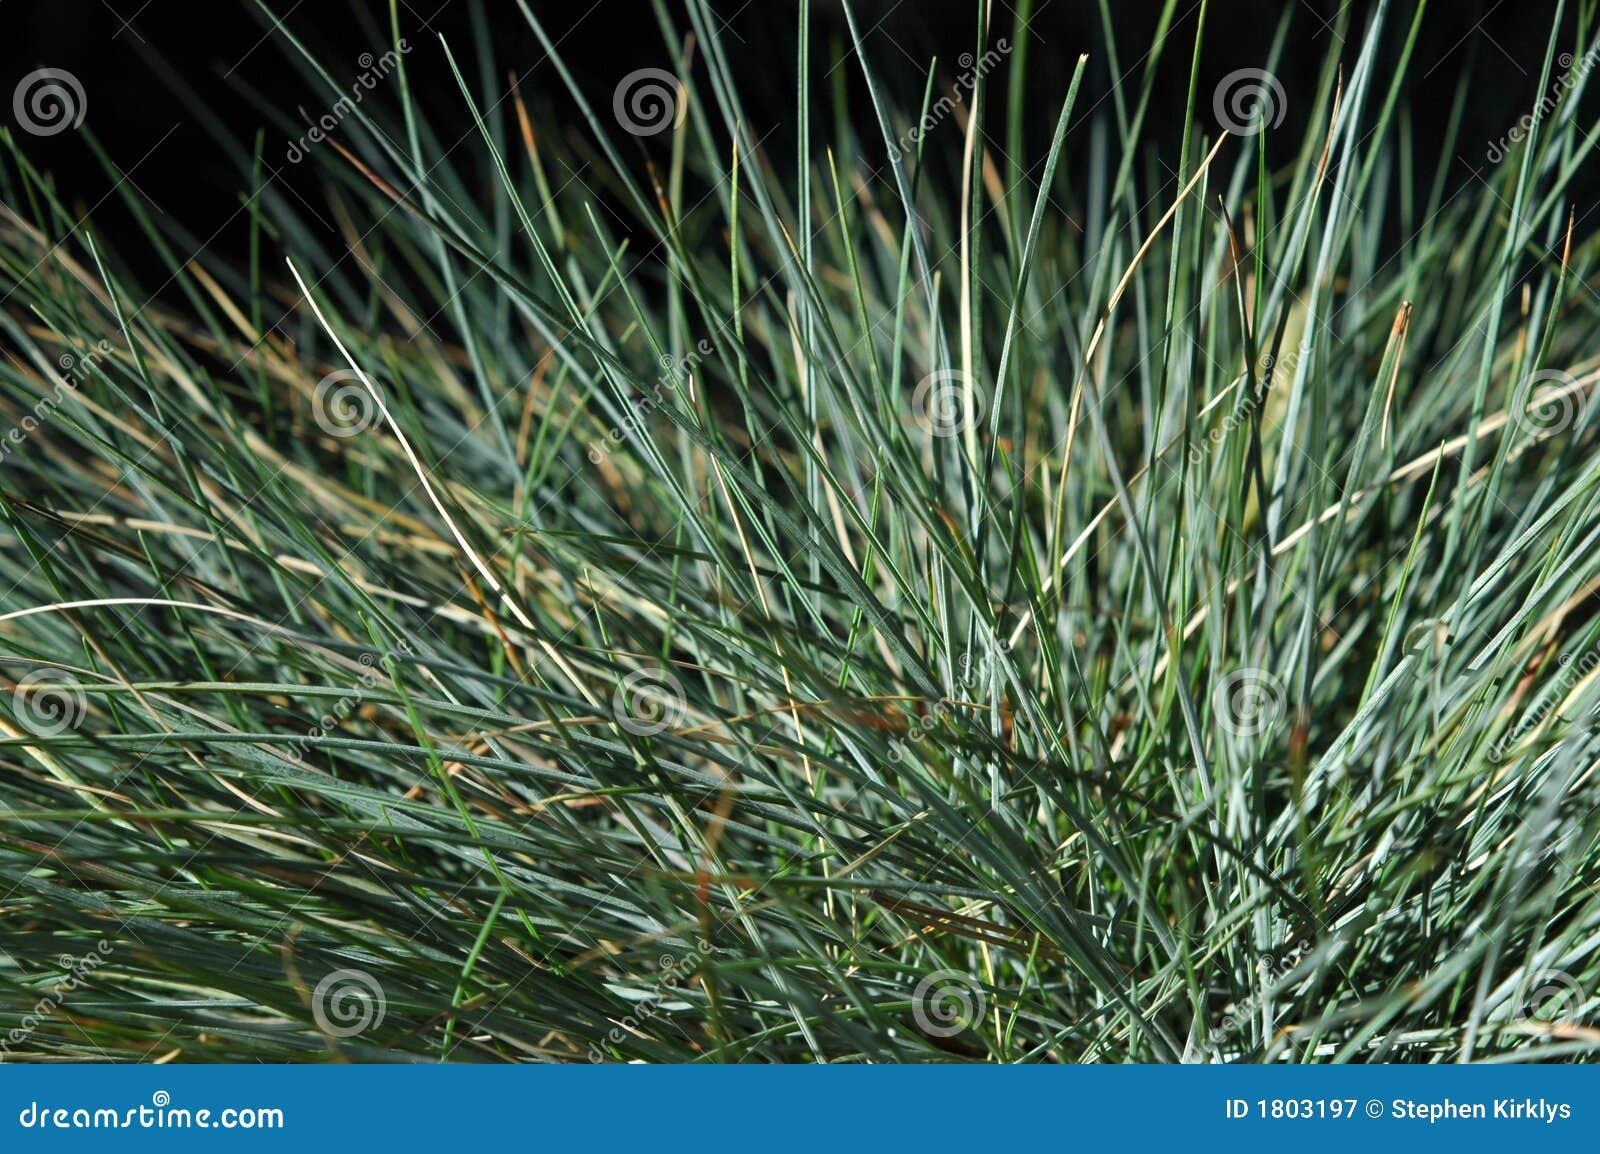 Blue Fescue Grass Macro Royalty Free Stock Photography